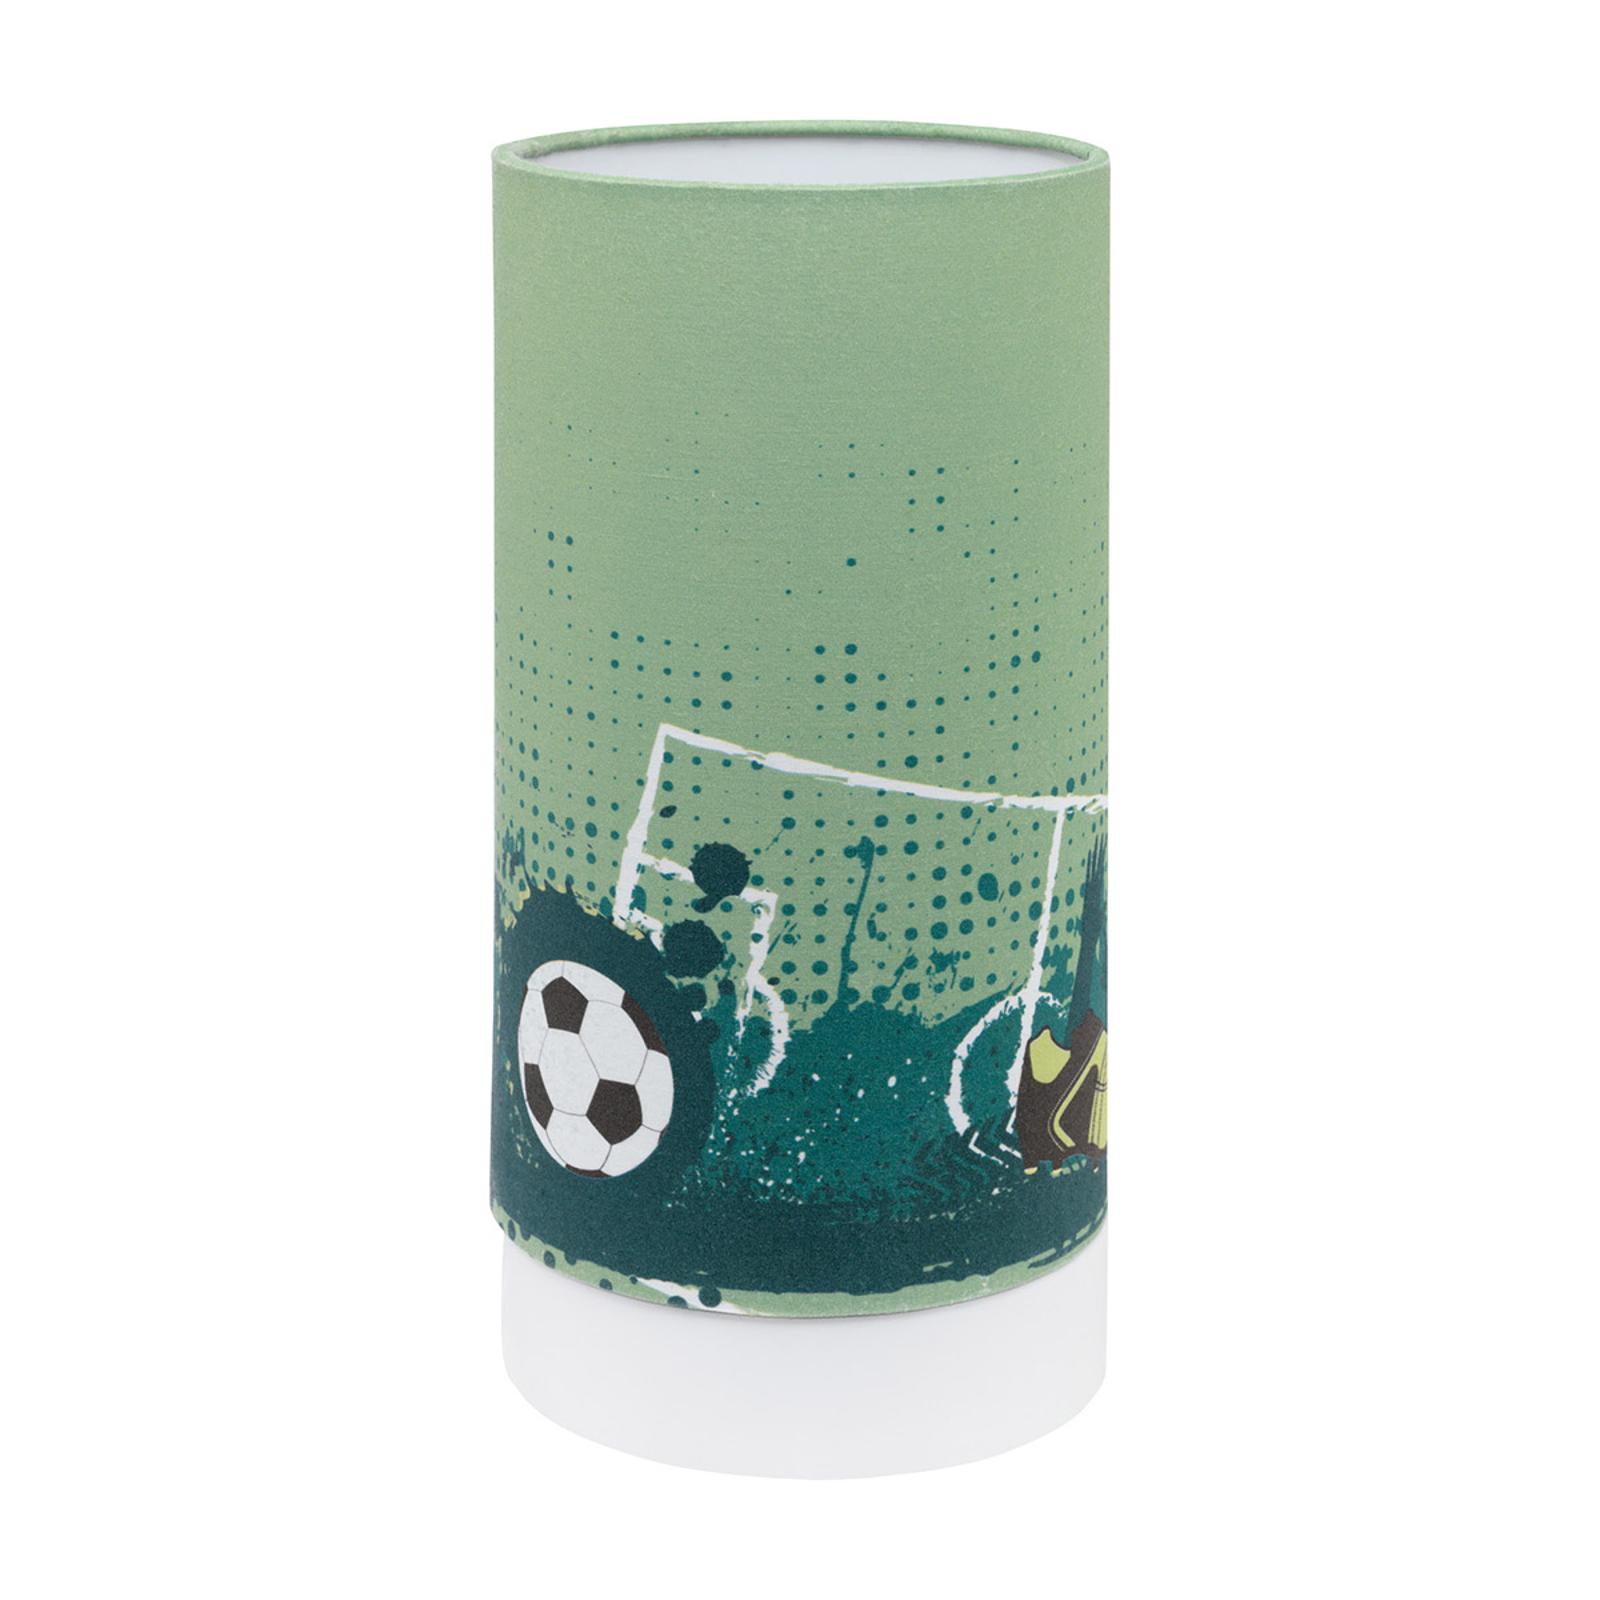 Lampe à poser LED Tabara motif de ballon de foot